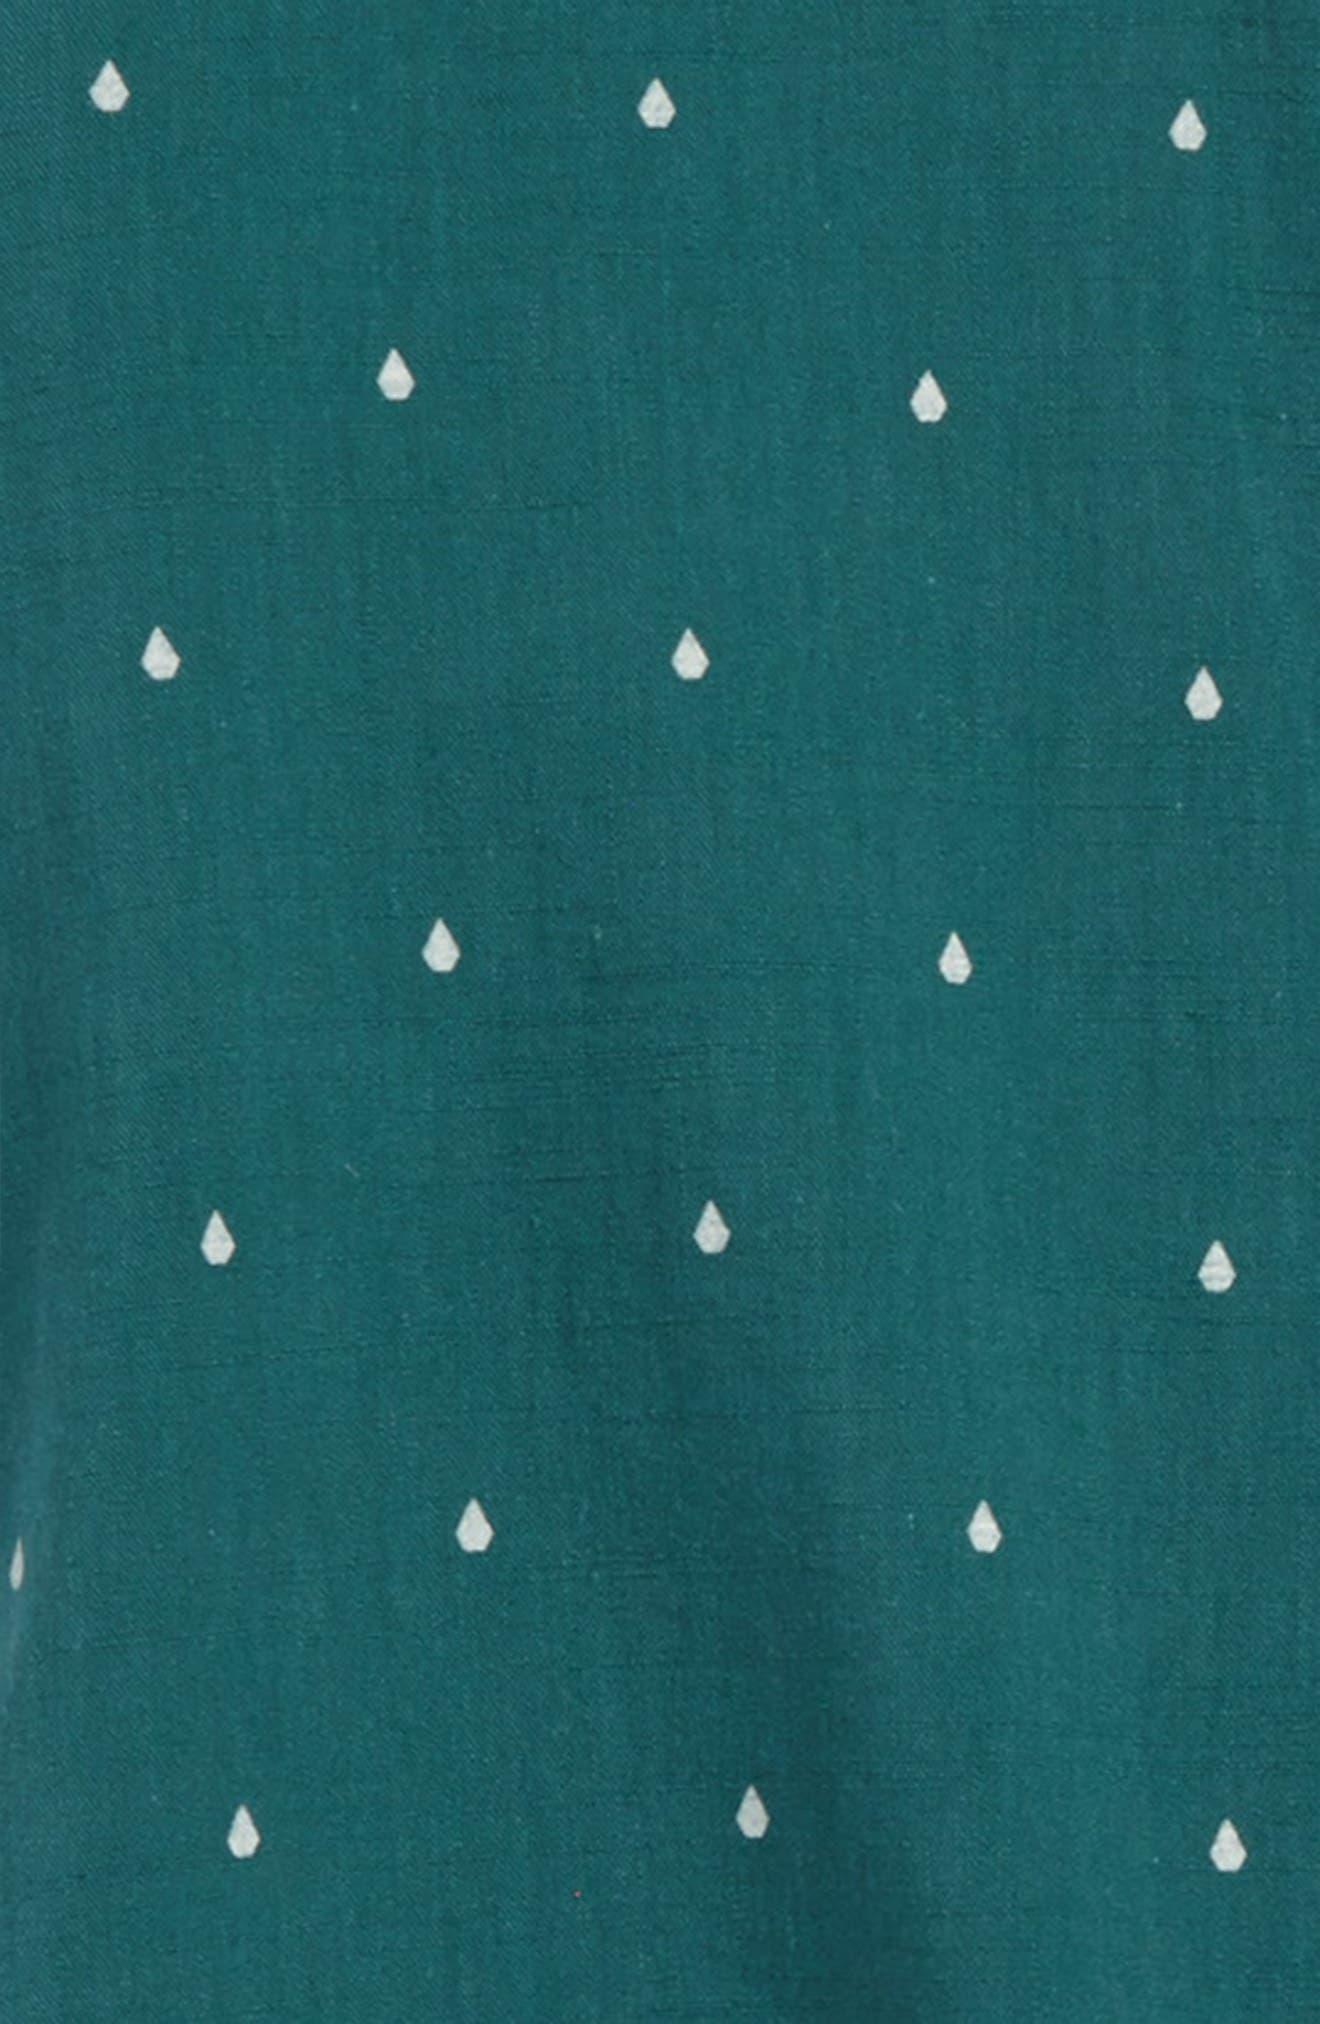 Stone Short Sleeve Woven Shirt,                             Alternate thumbnail 2, color,